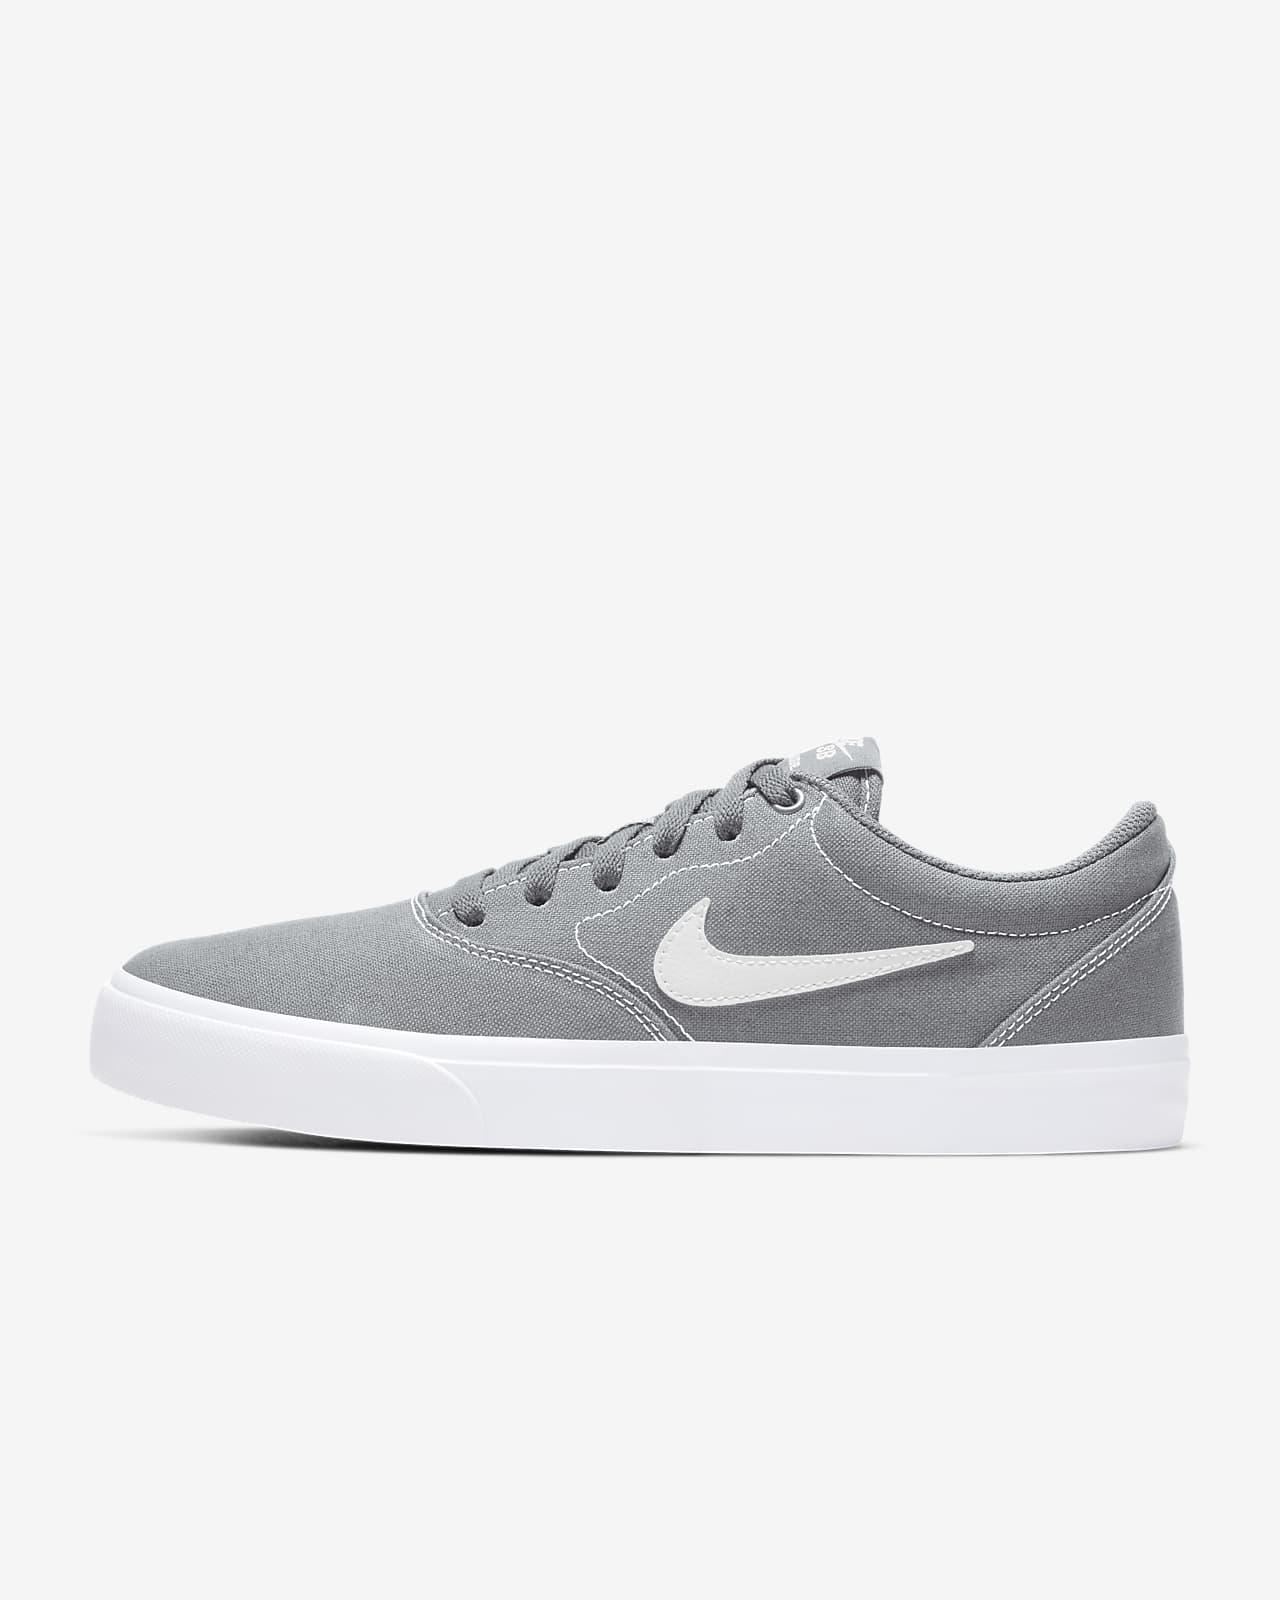 Nike SB Charge Canvas 滑板鞋